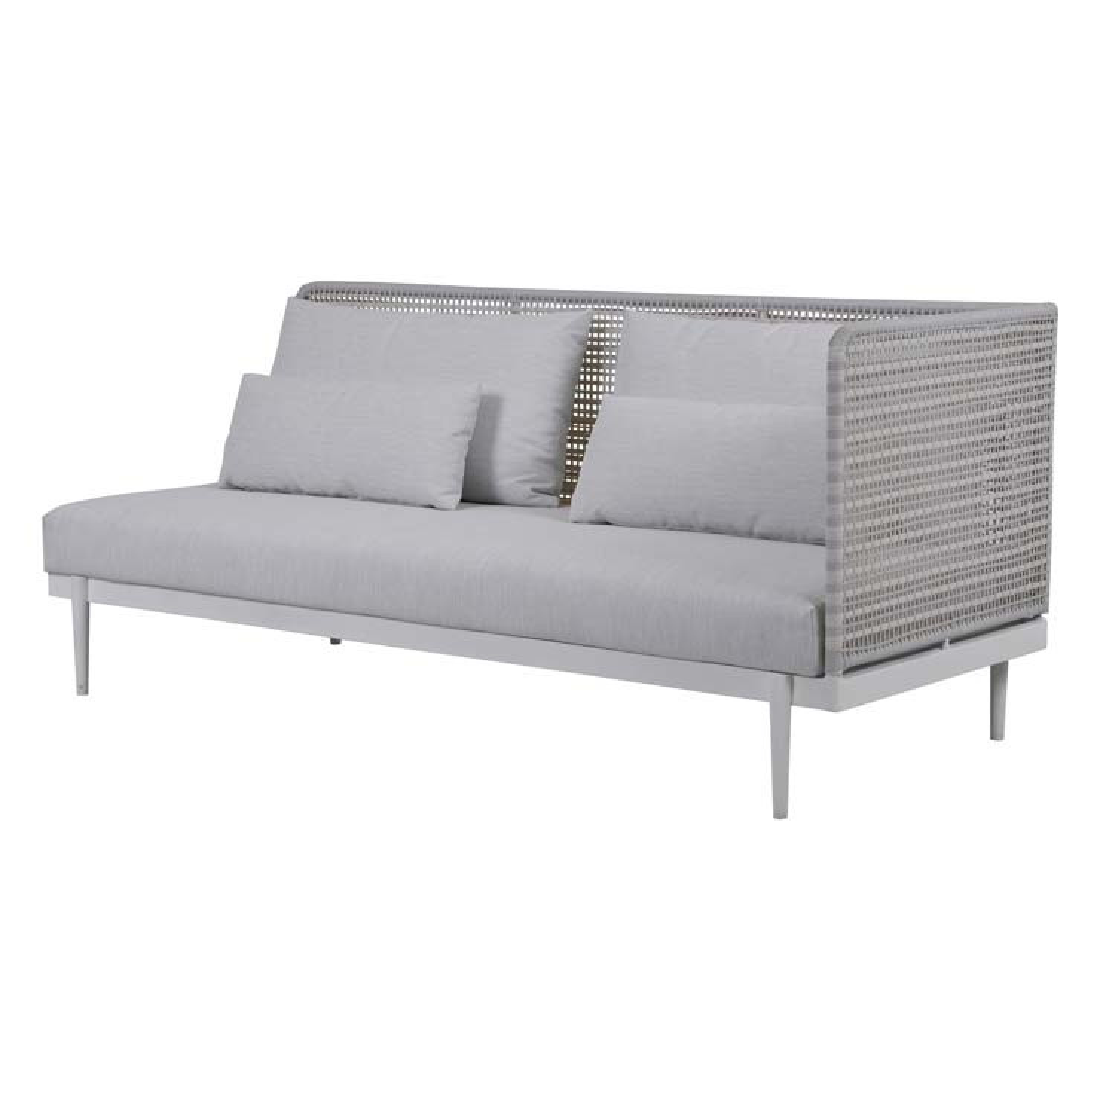 Cabana Link 2 Seater Right Arm Sofa